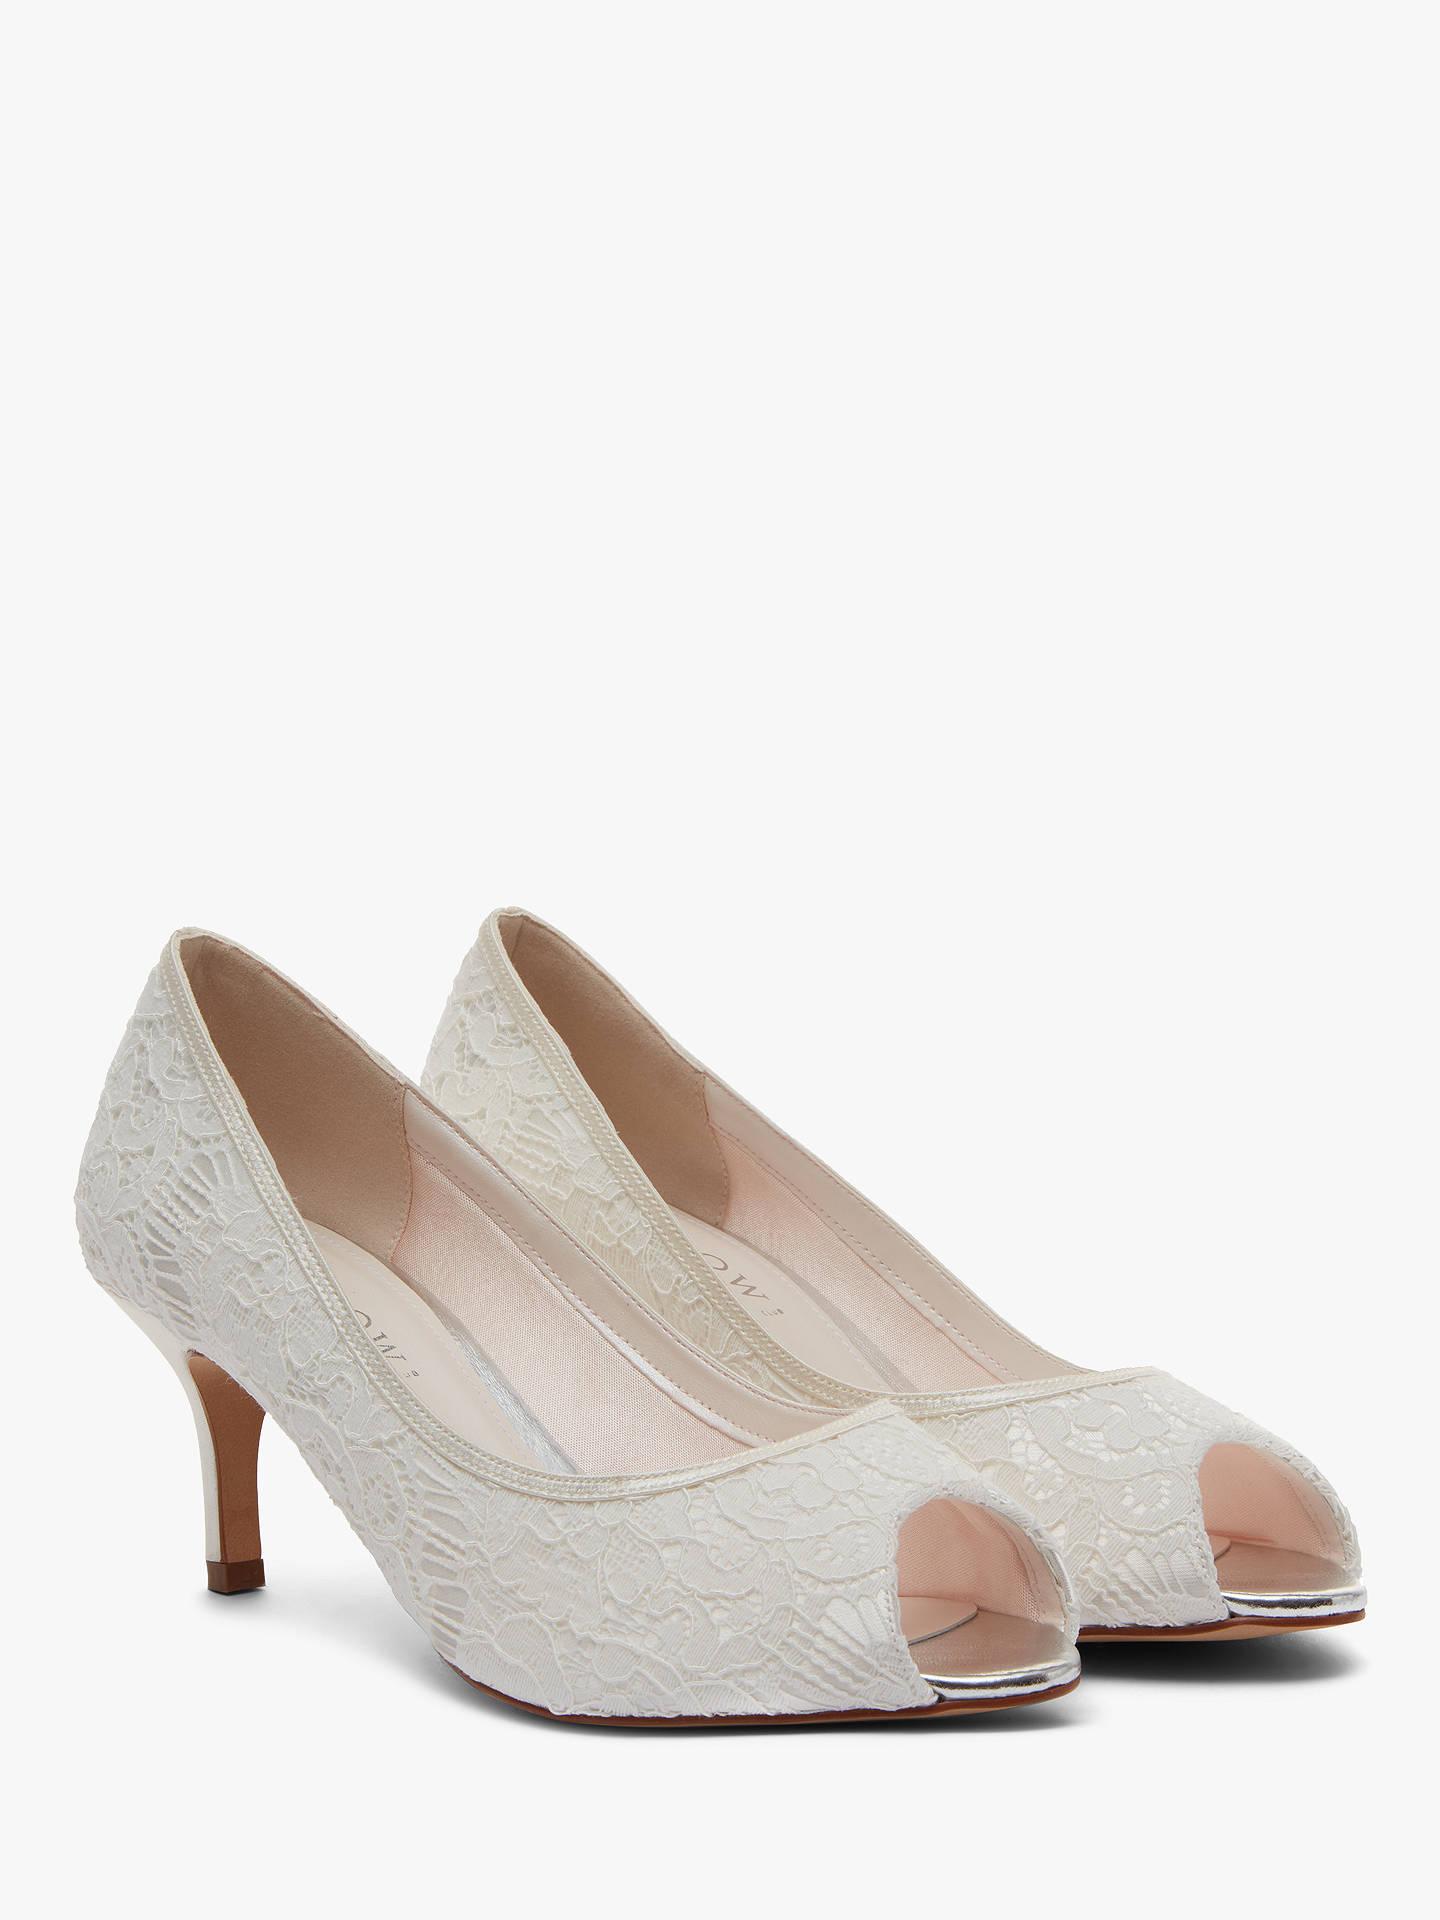 3aa792f4278c Buy Rainbow Club Ava Peep Toe Court Shoes